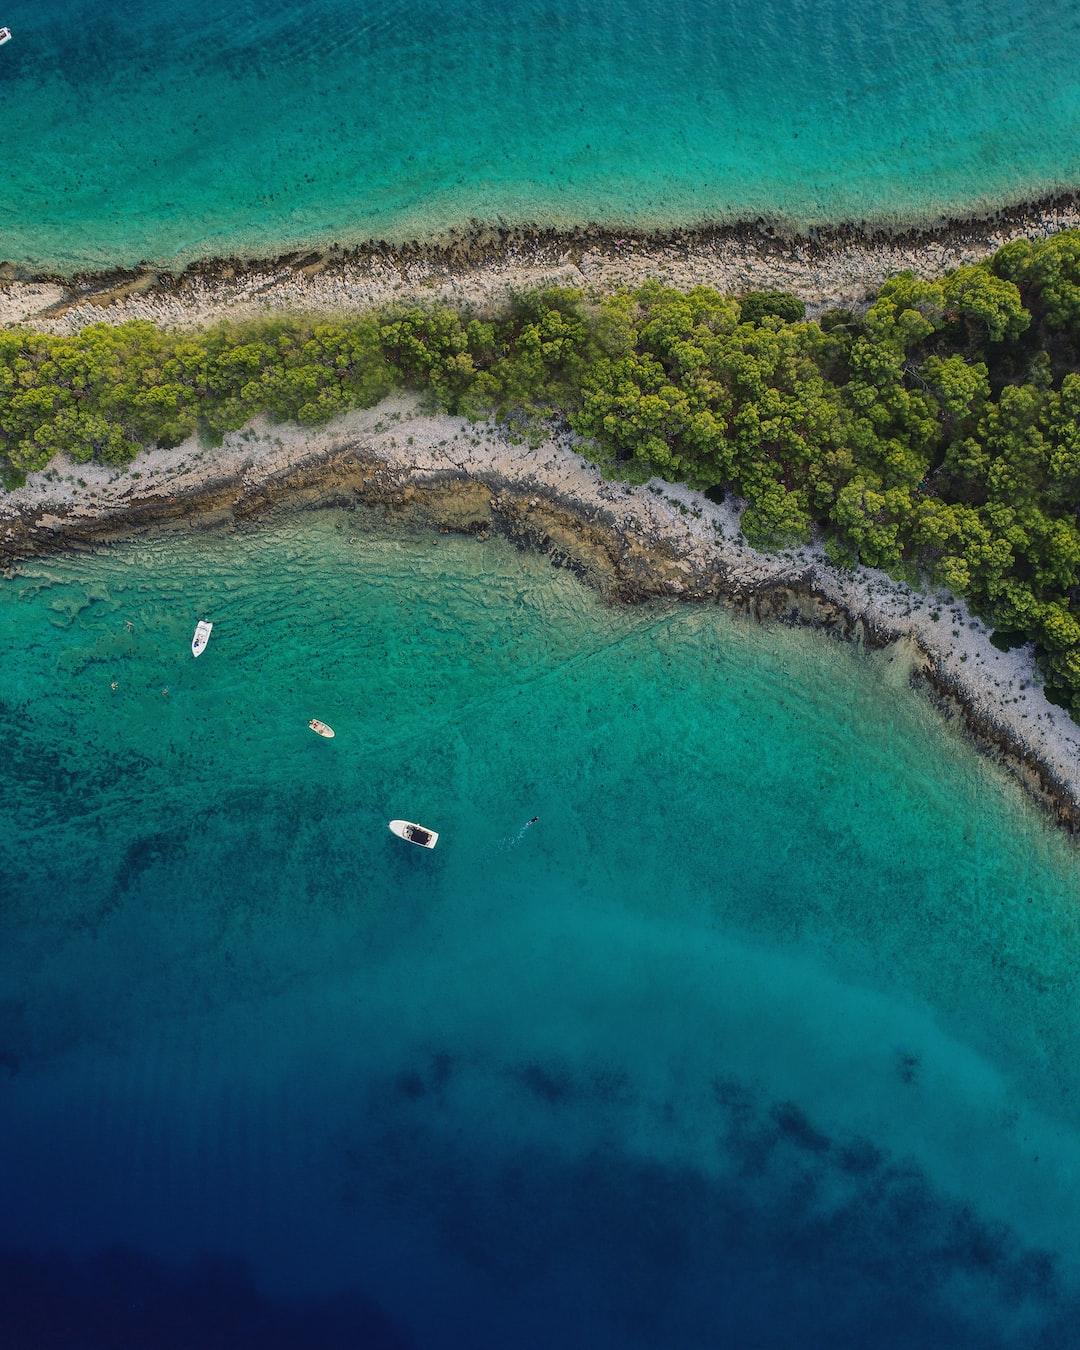 Top down shot of a peninsula on the Mala Krbela island in Croatia